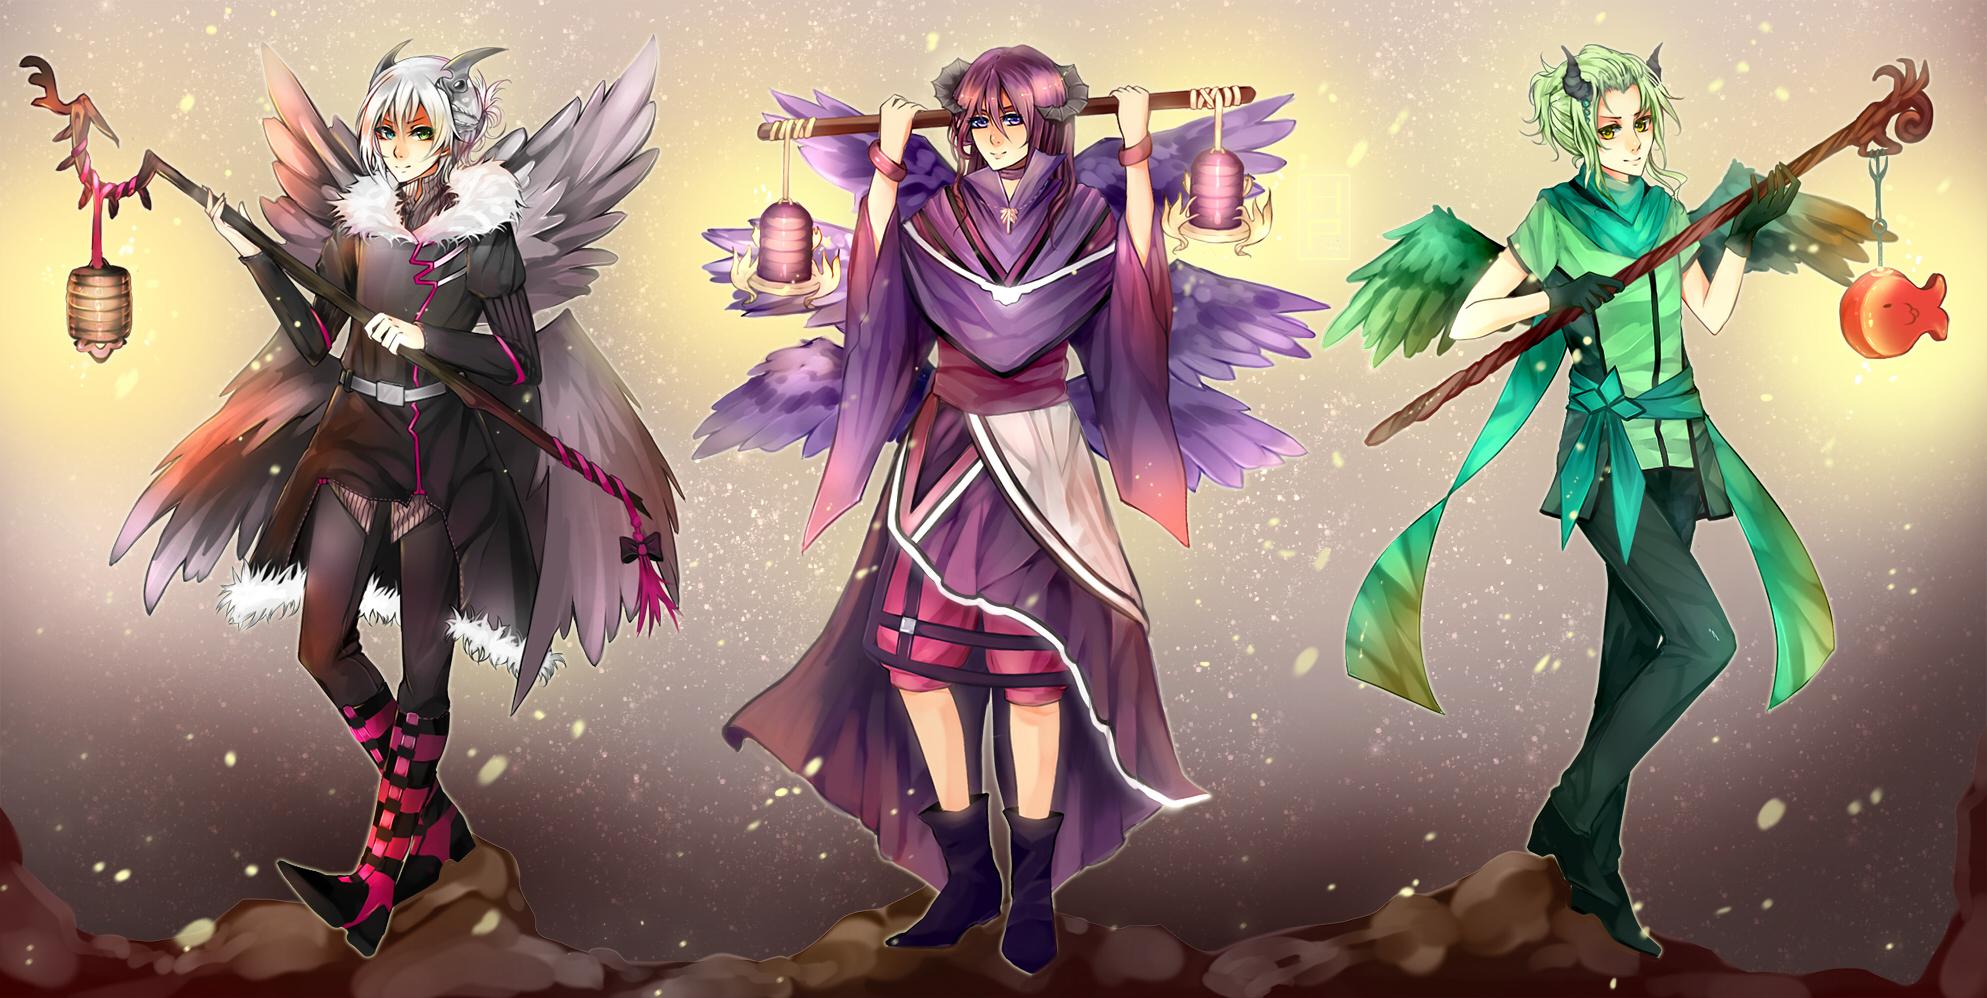 Commission for Vaniraa by Harumagai